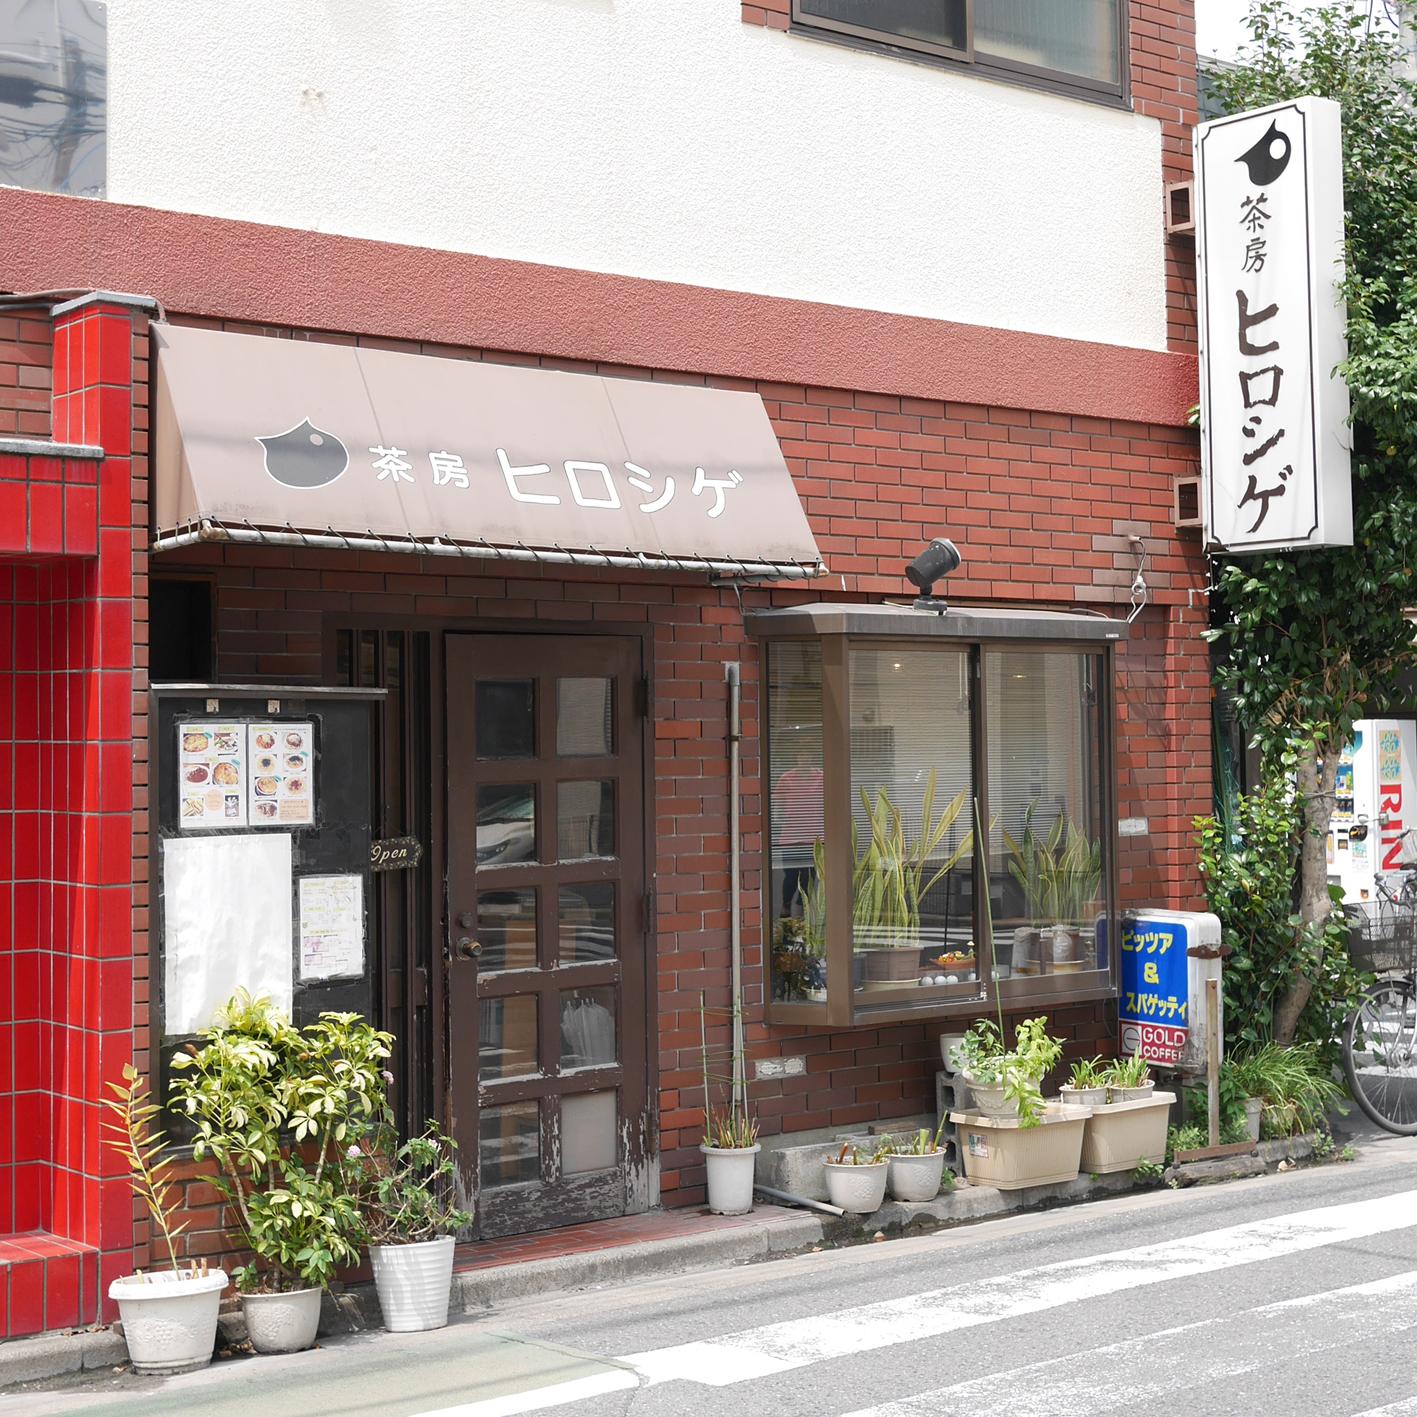 sabouhiroshige1.jpg